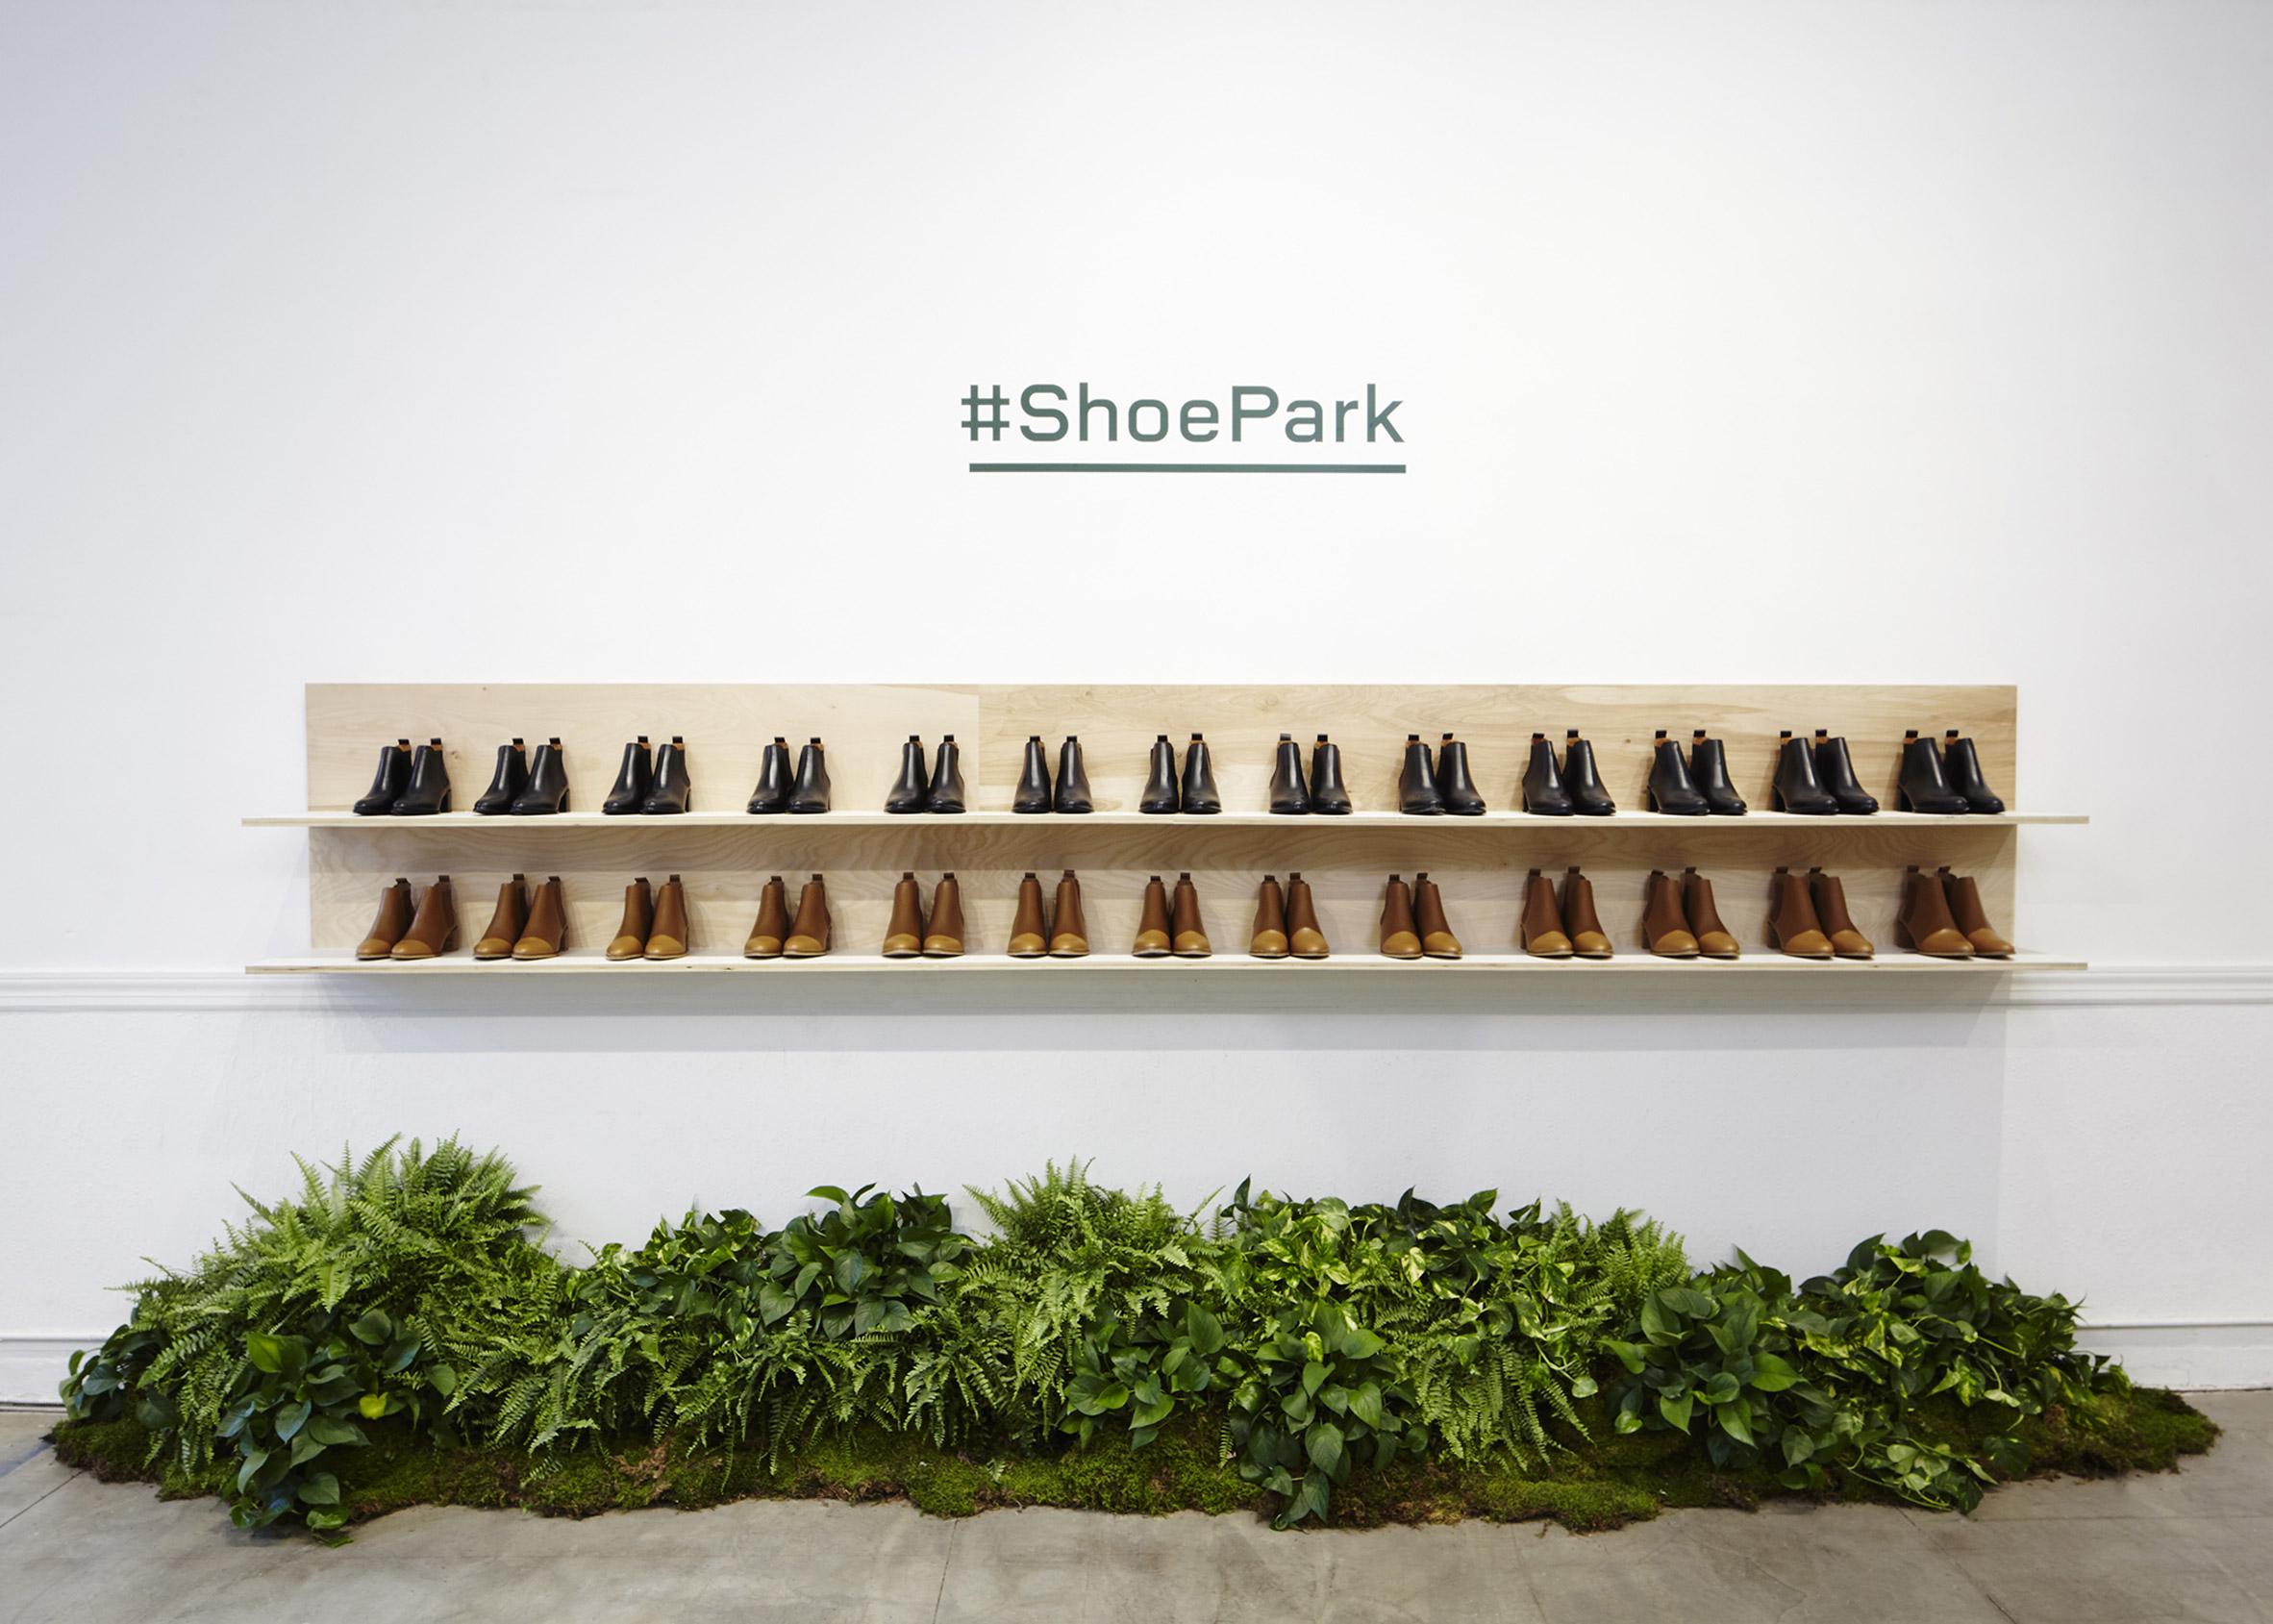 Everlane Shoe Park by Robert Storey